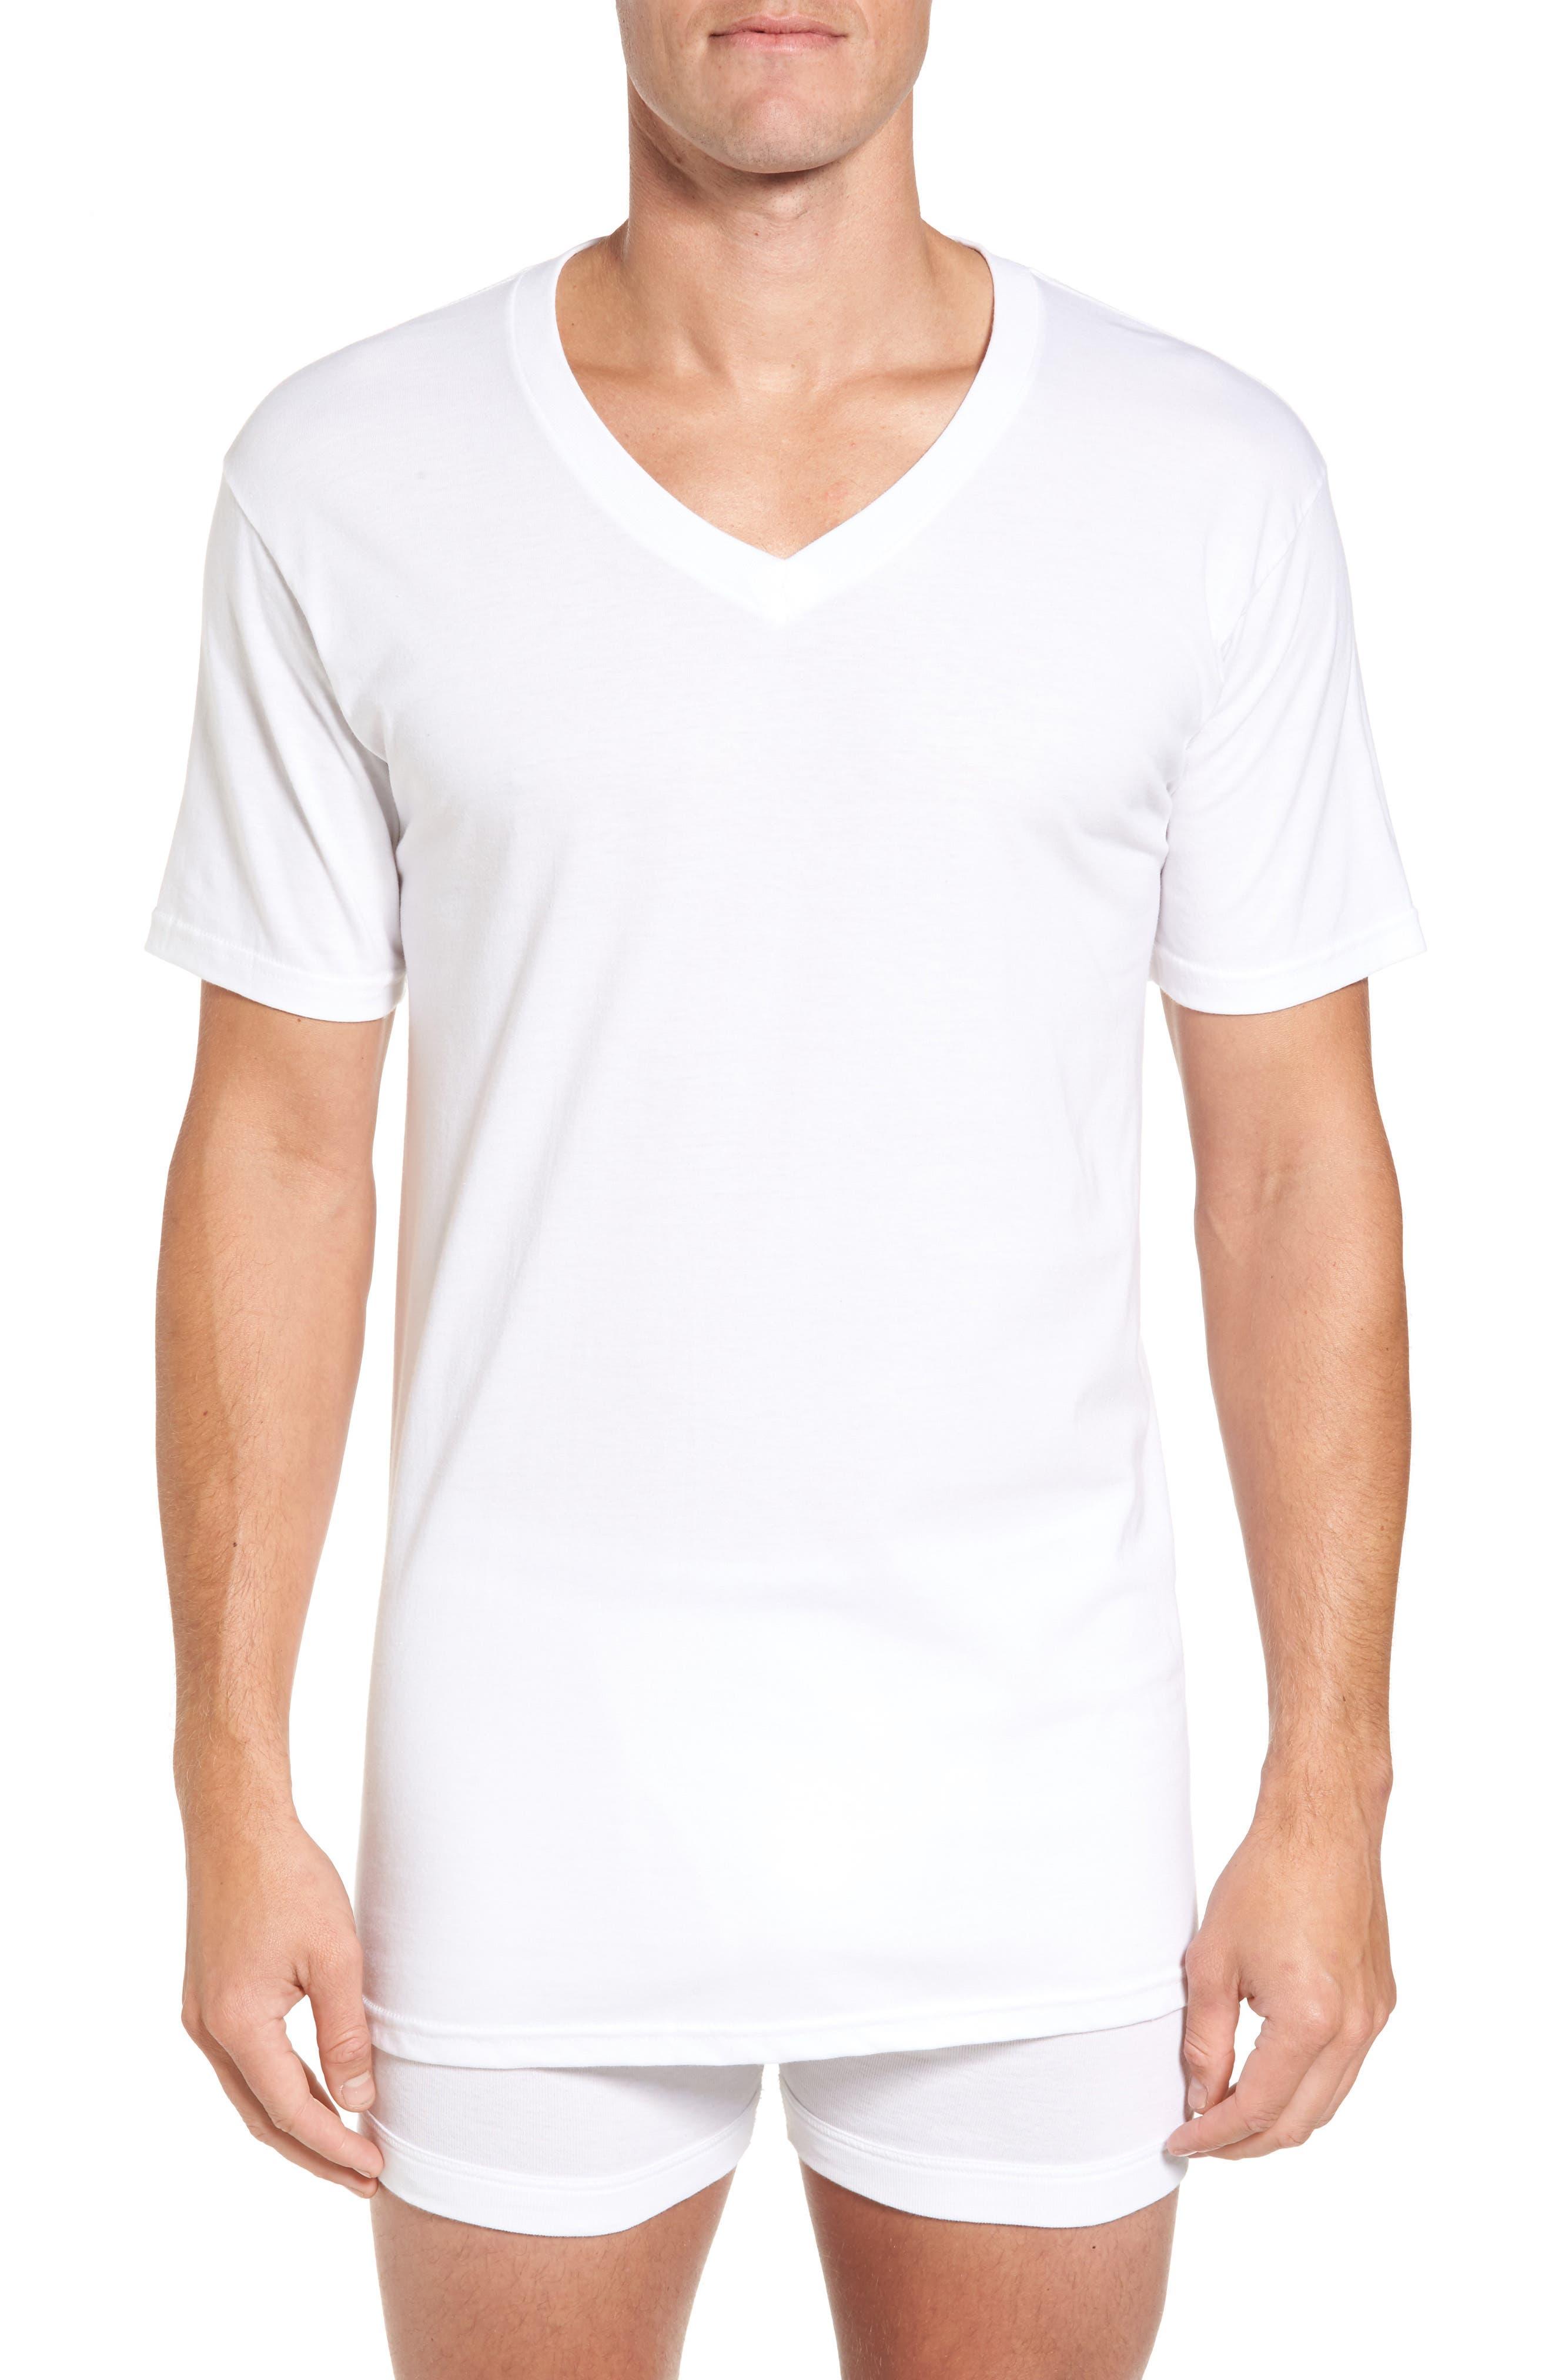 NORDSTROM MEN'S SHOP 4-Pack Regular Fit Supima<sup>®</sup> Cotton V-Neck T-Shirts, Main, color, WHITE